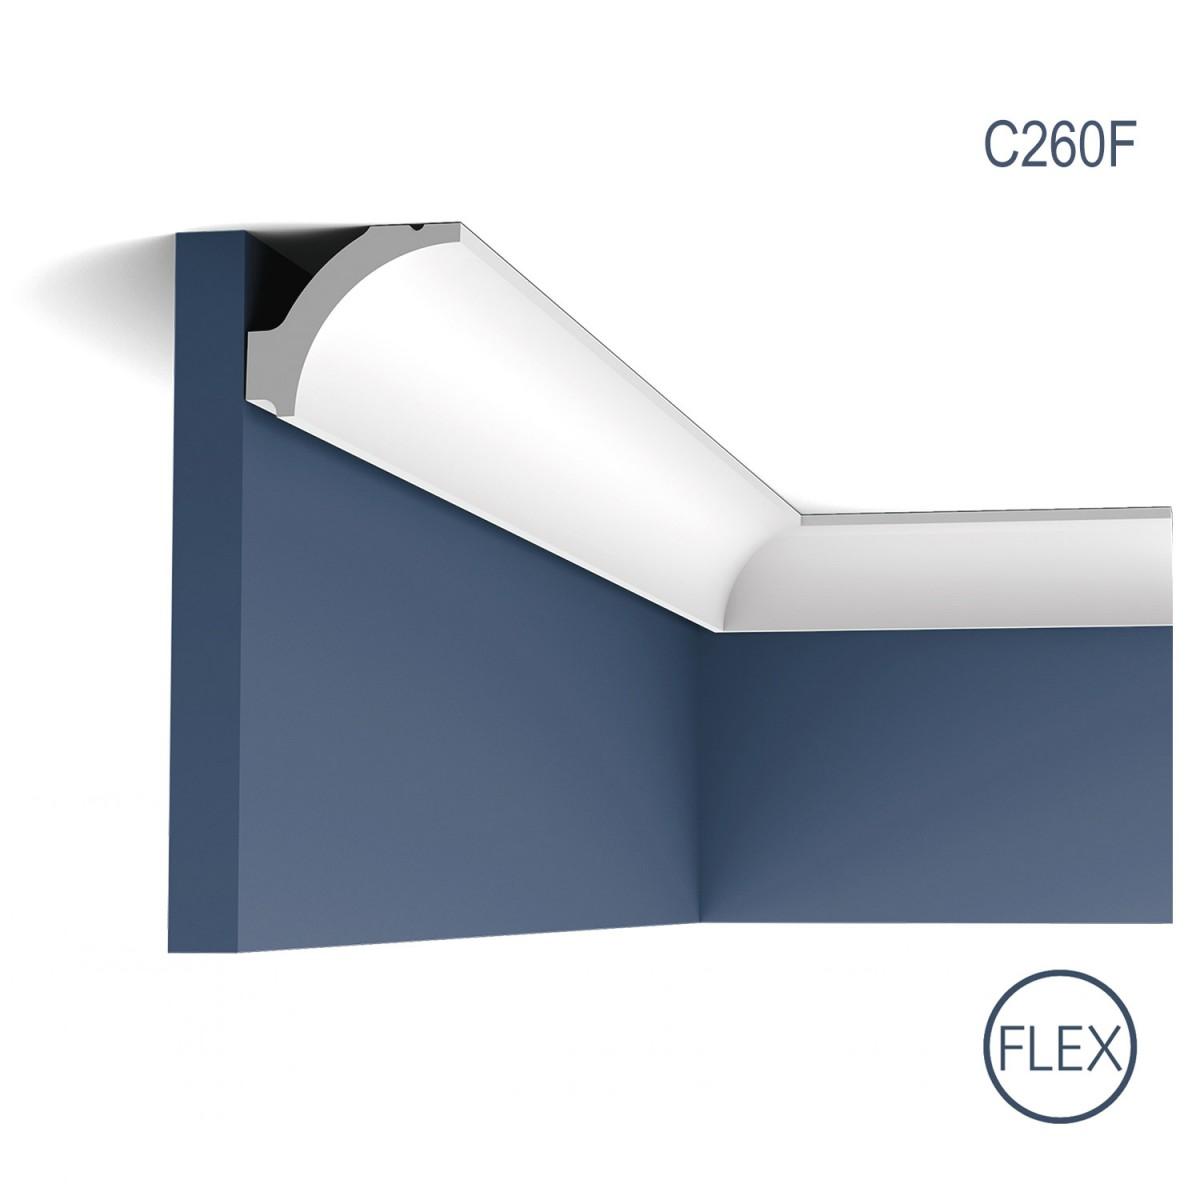 Cornisa Flex Luxxus C260F, Dimensiuni: 200 X 4.1 X 4.8 cm, Orac Decor